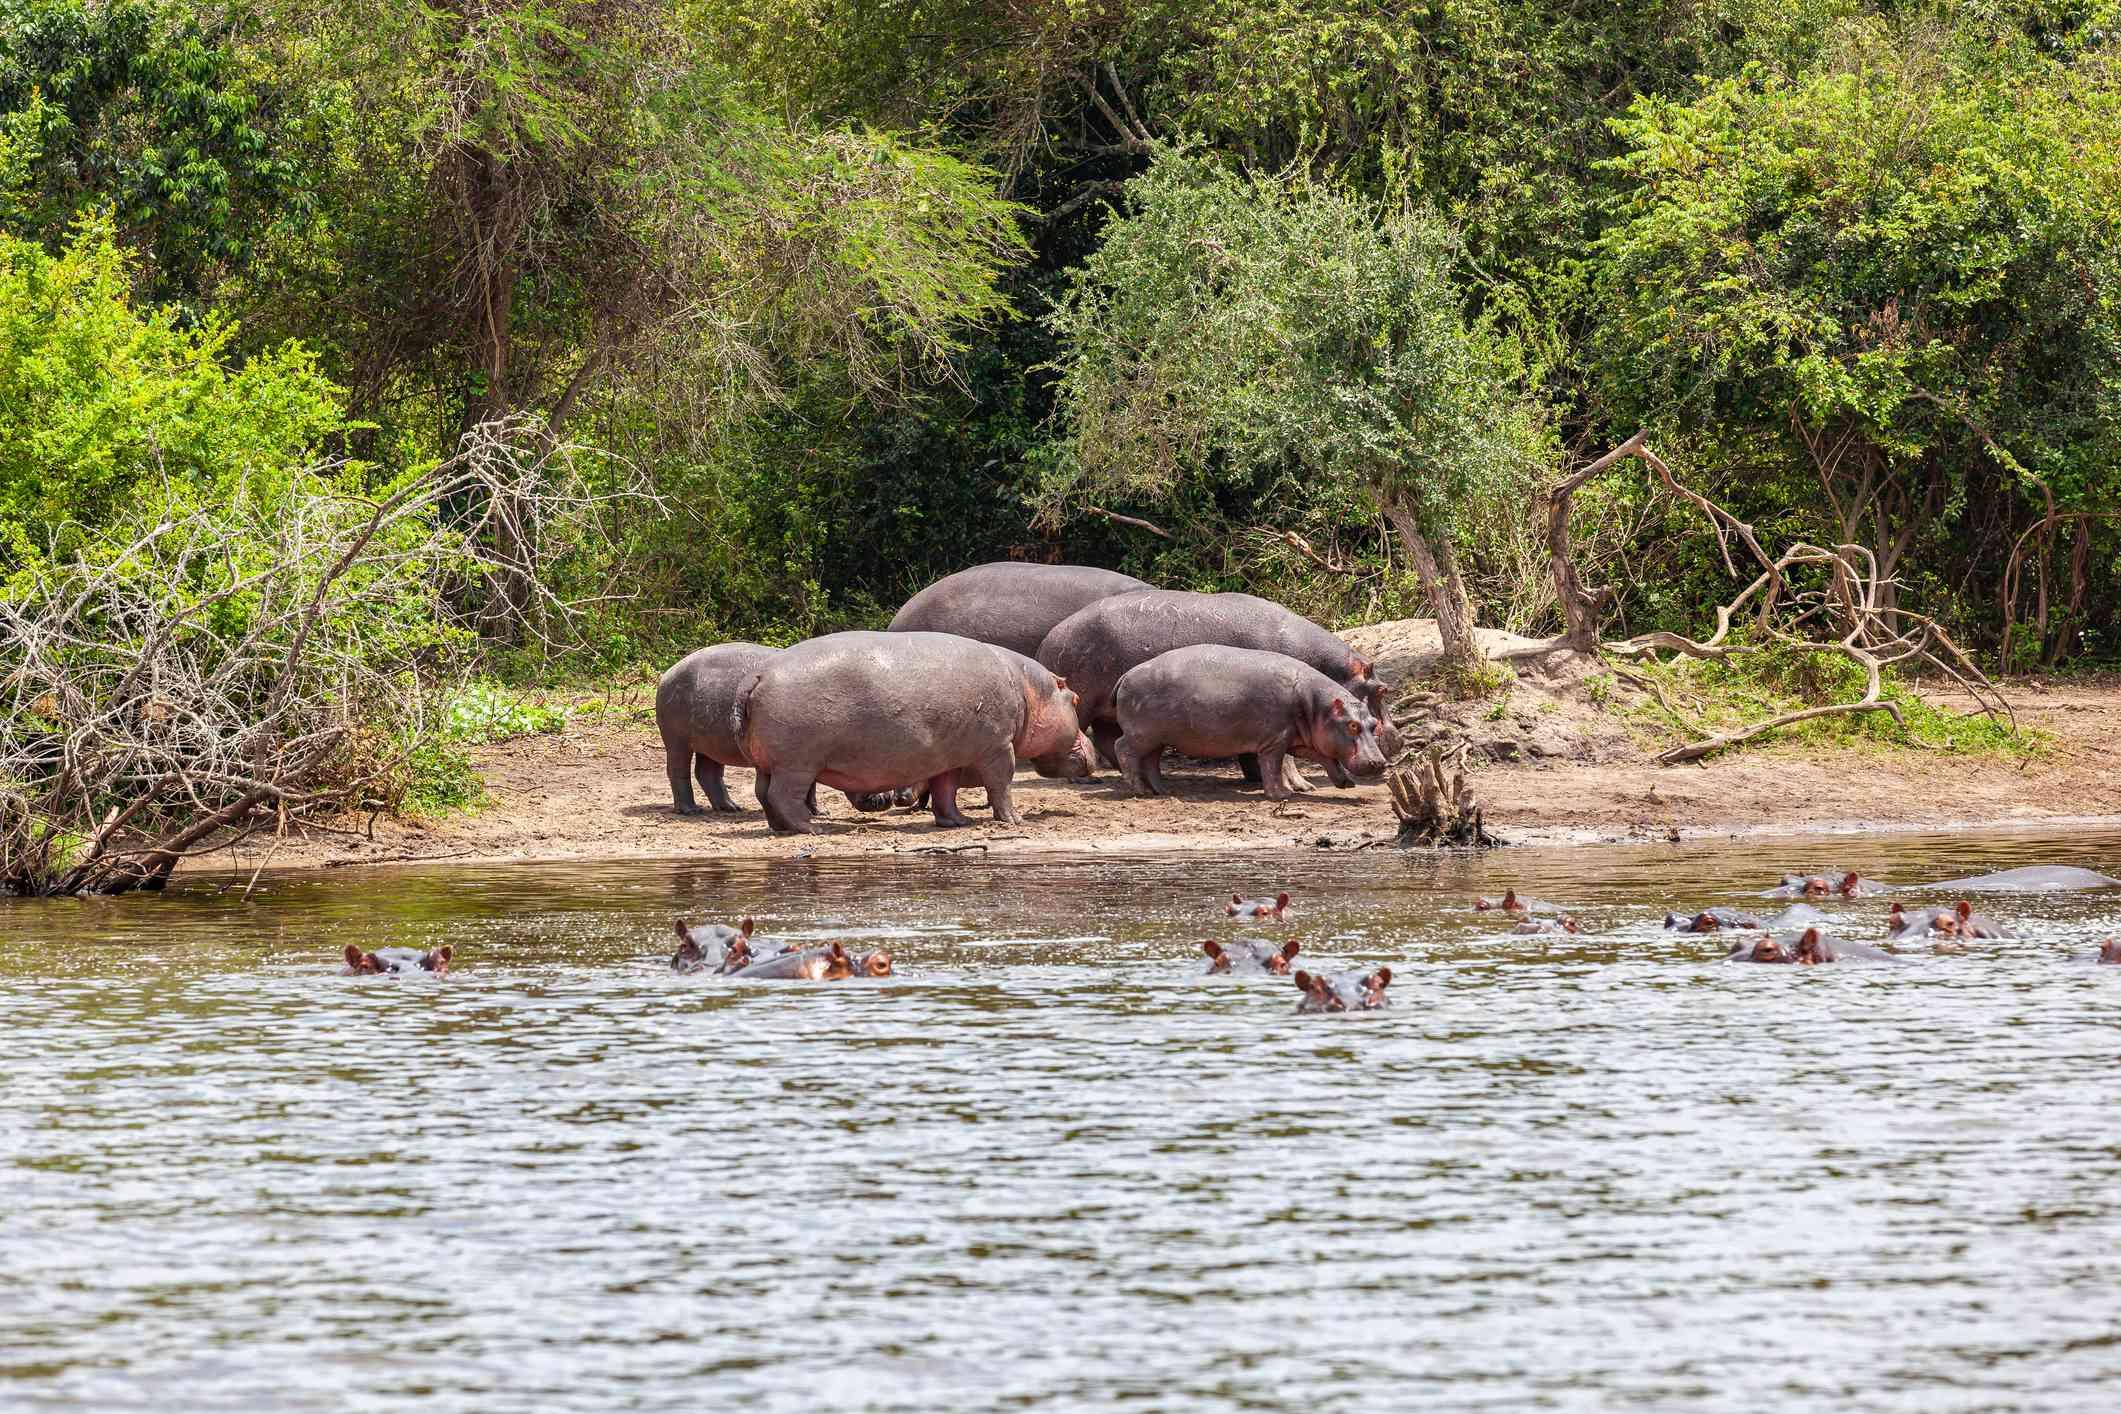 Hippos on the bank of Lake Mburo, Uganda